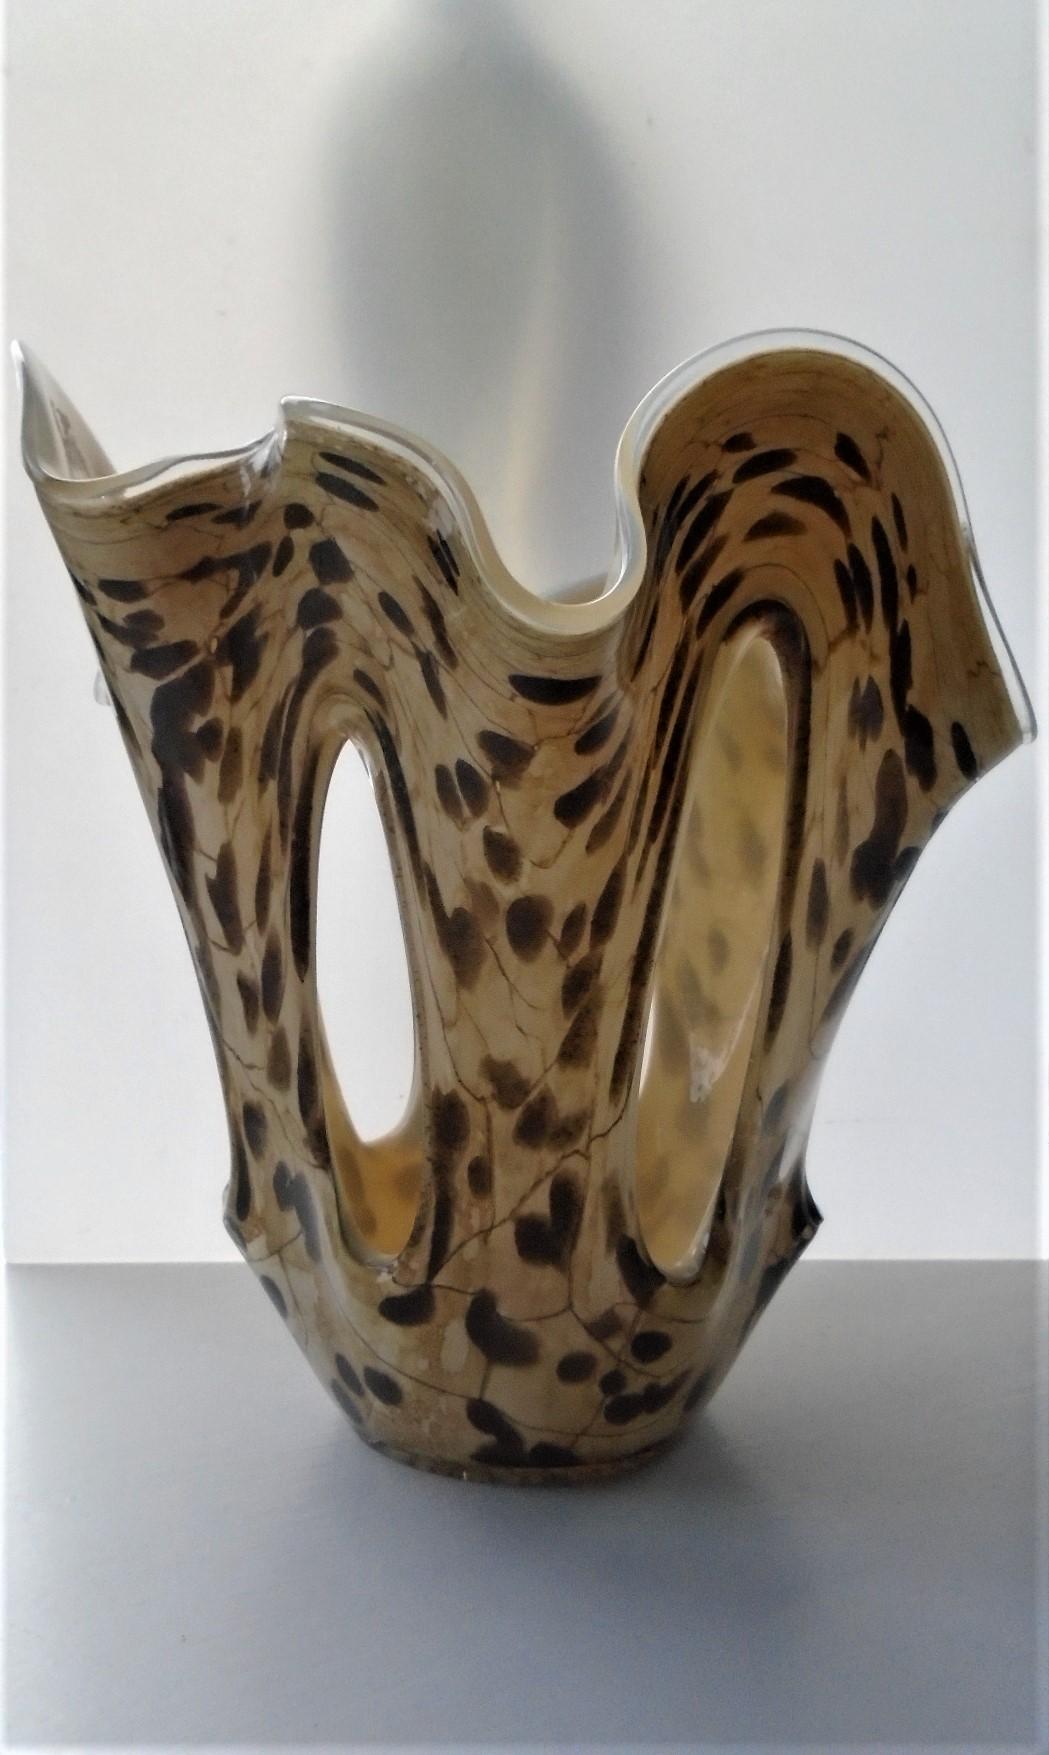 80s vintage Jozefina Krosno Glass Bowl.